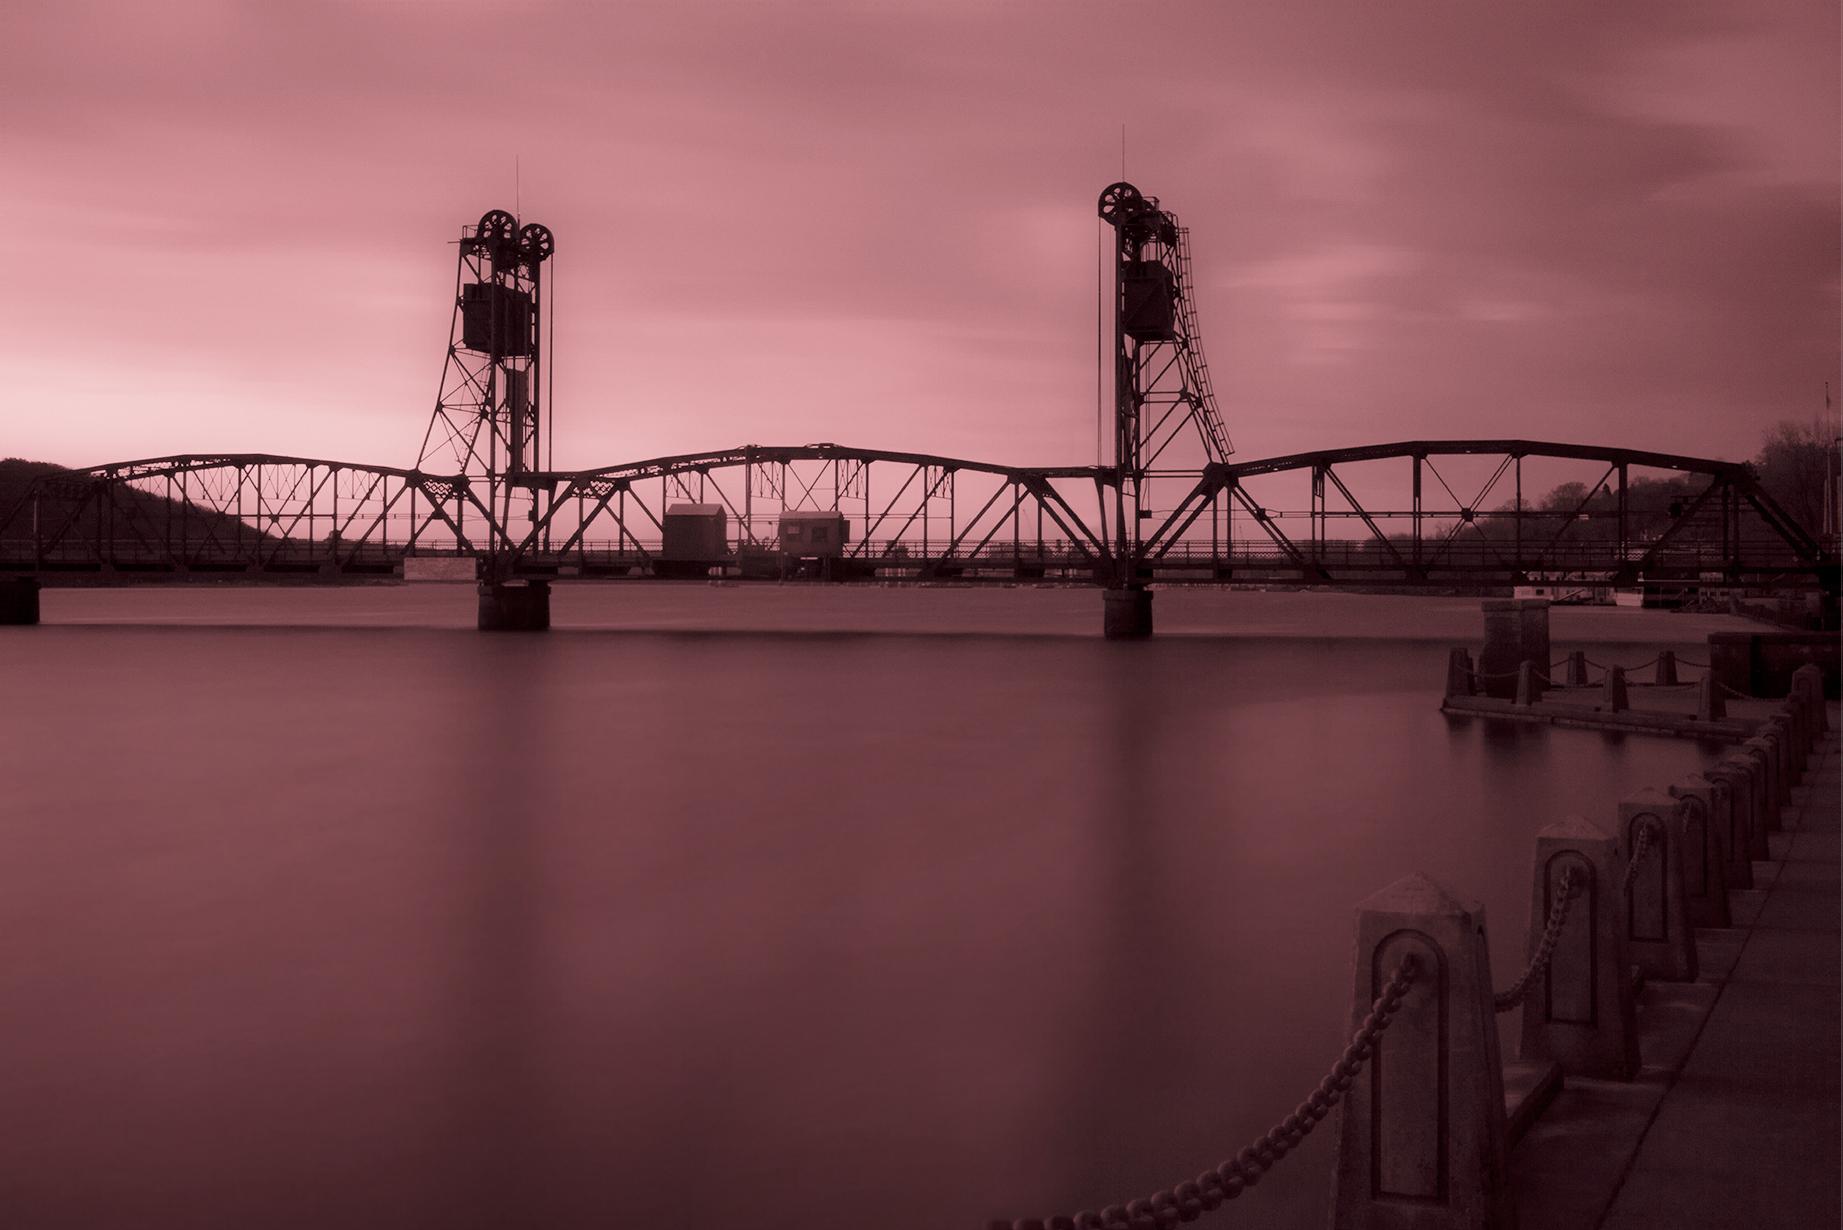 infrared lift bridge_4x6.jpg